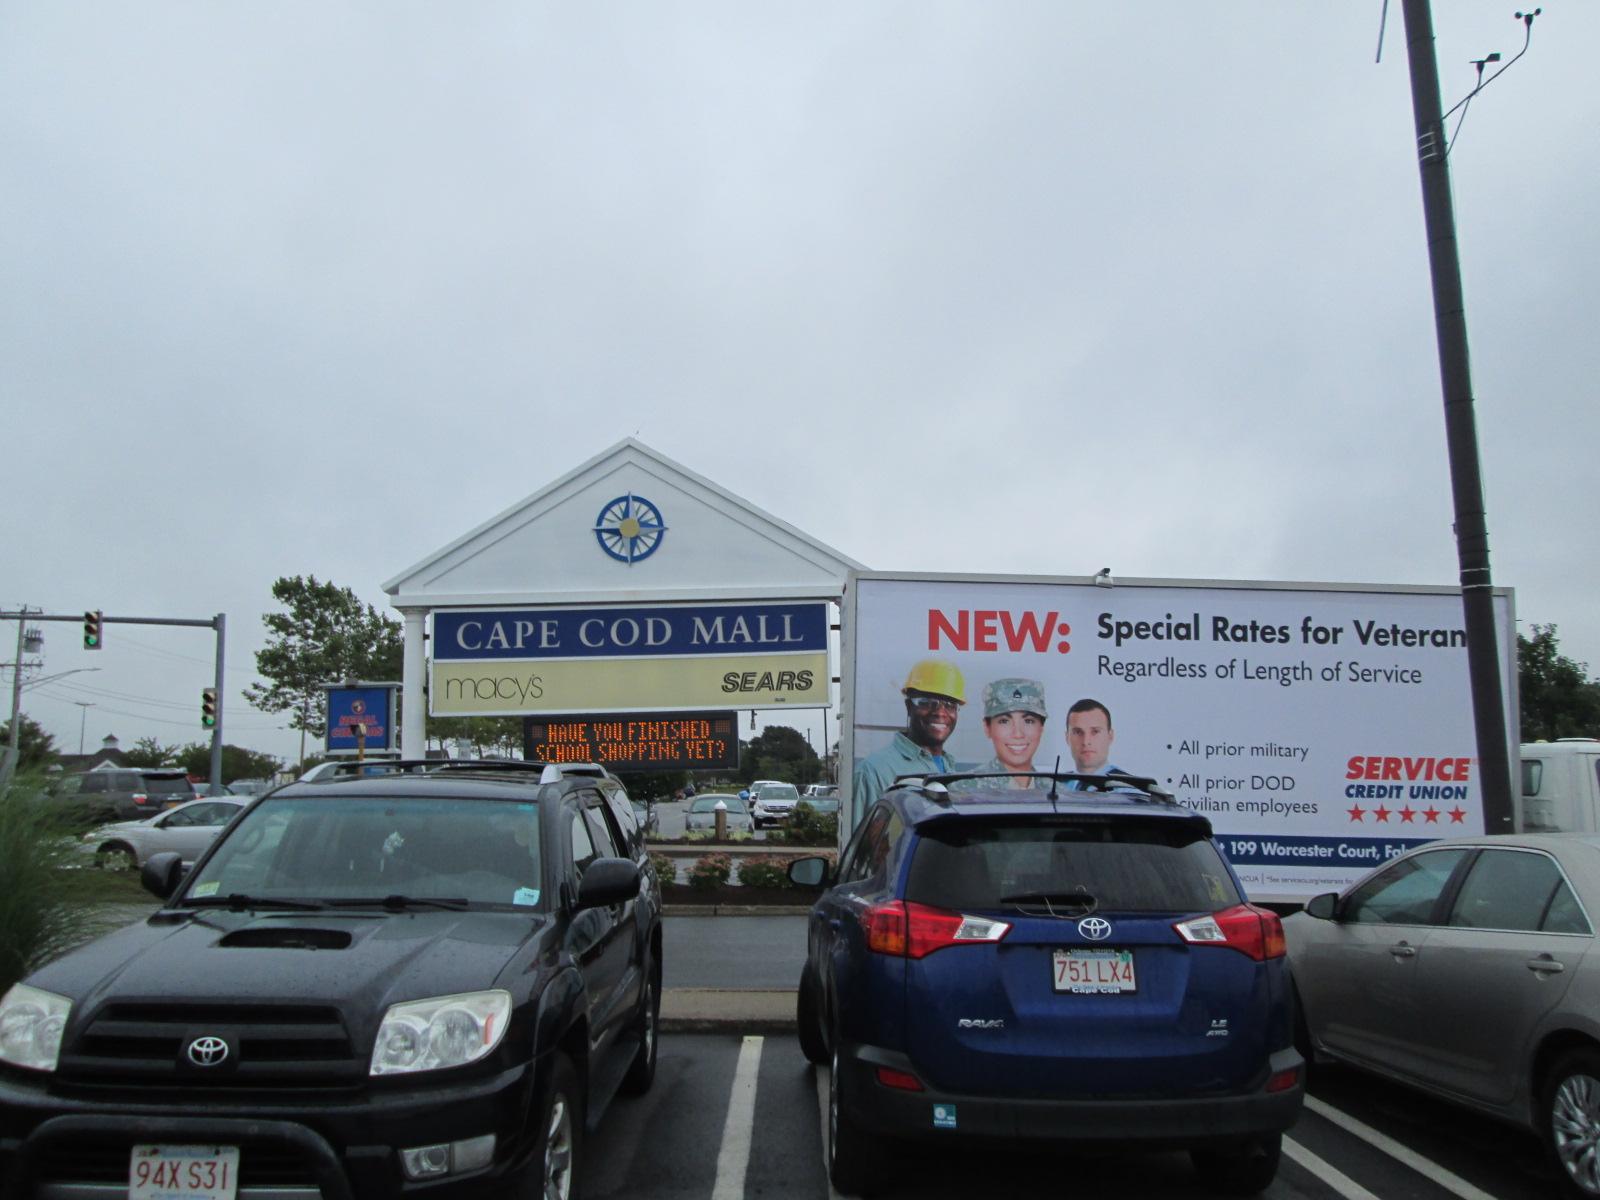 Billboard truck in Hyannis, Cape Cod, MA